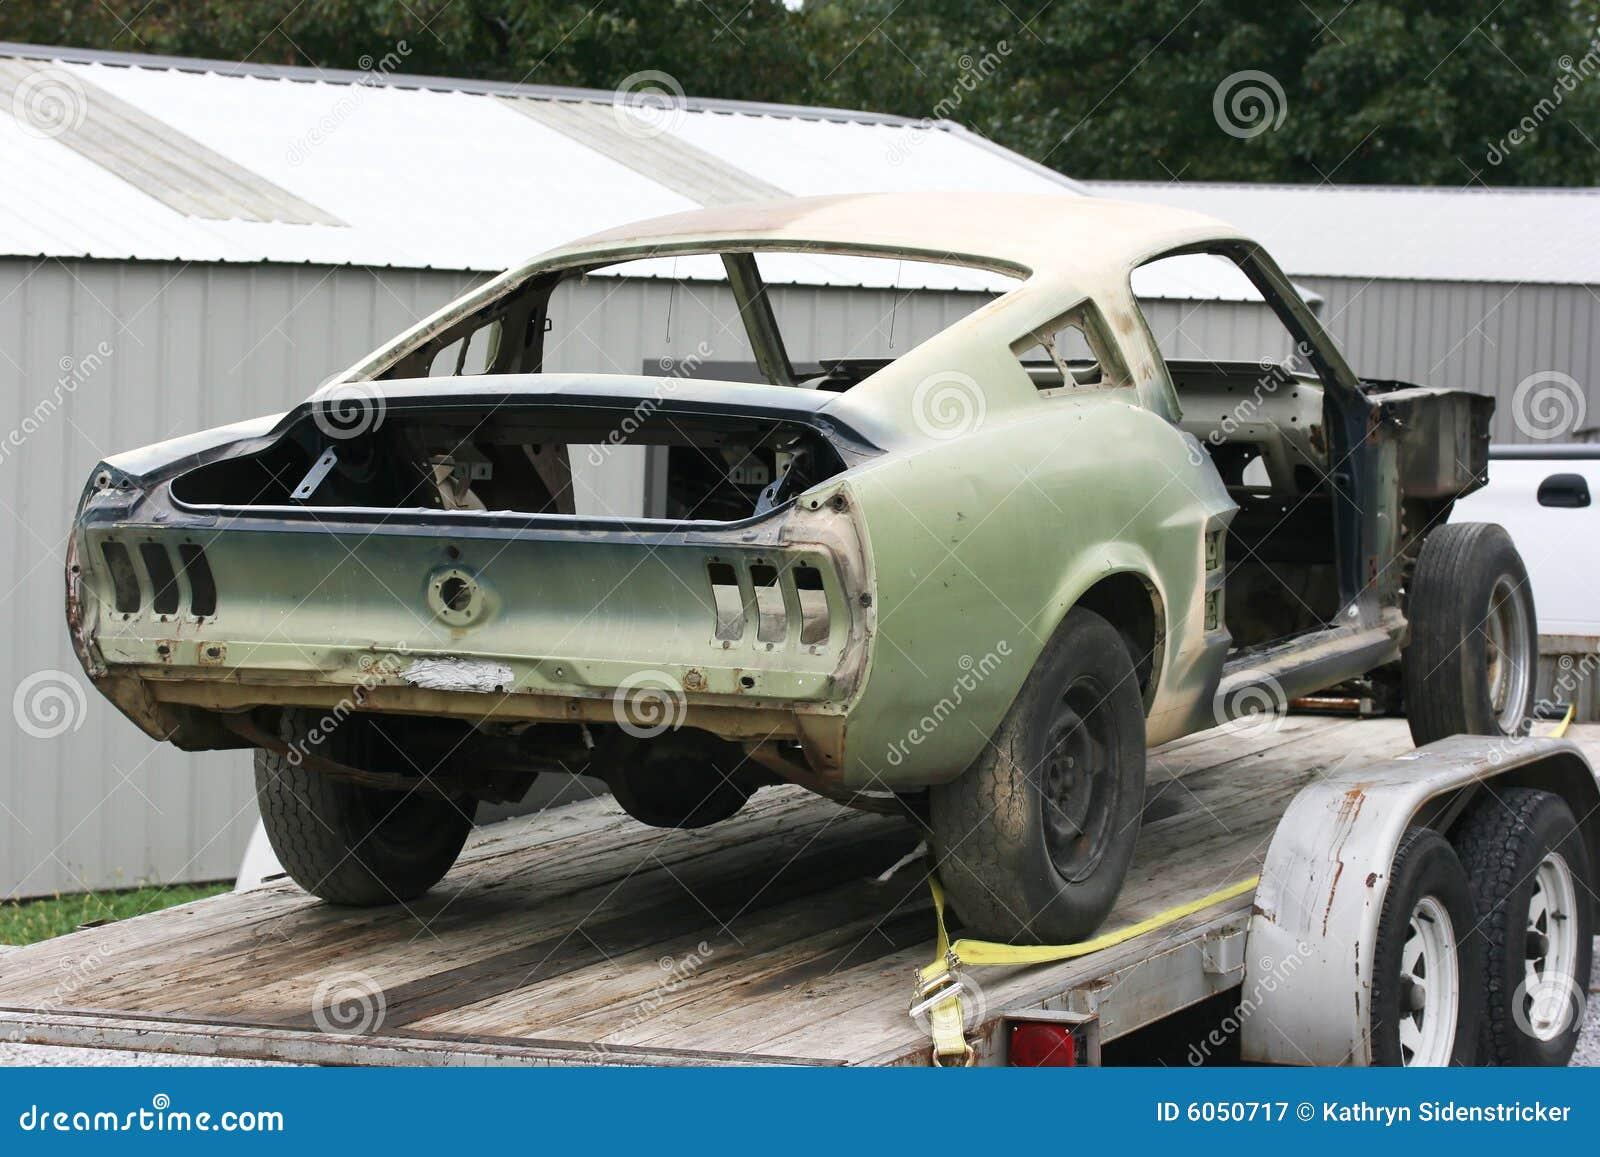 1967 Mustang Fastback Rebuild Royalty Free Stock